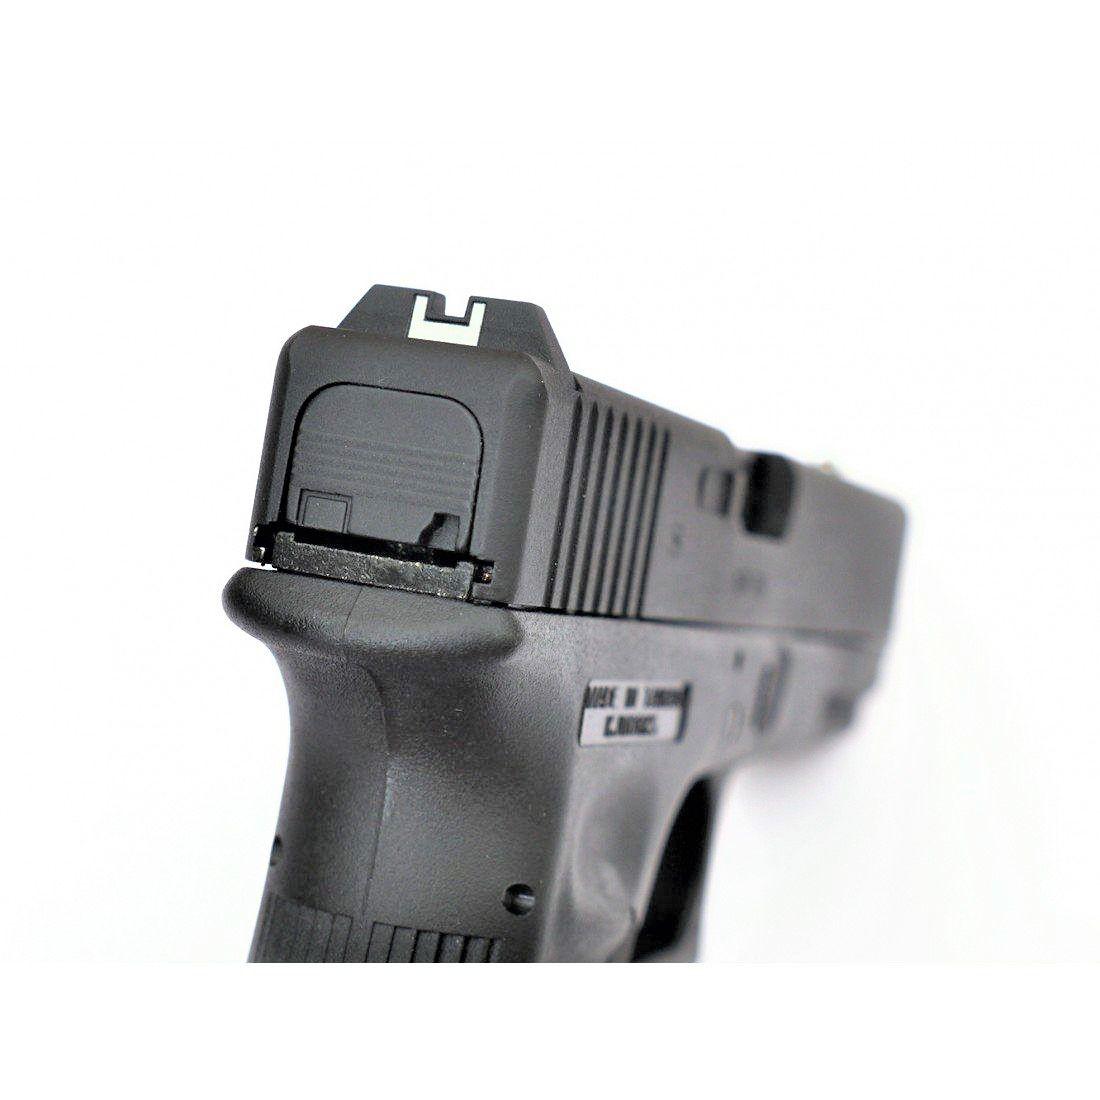 Pistola Airsoft KJW Glock G17 Kp17 Preta